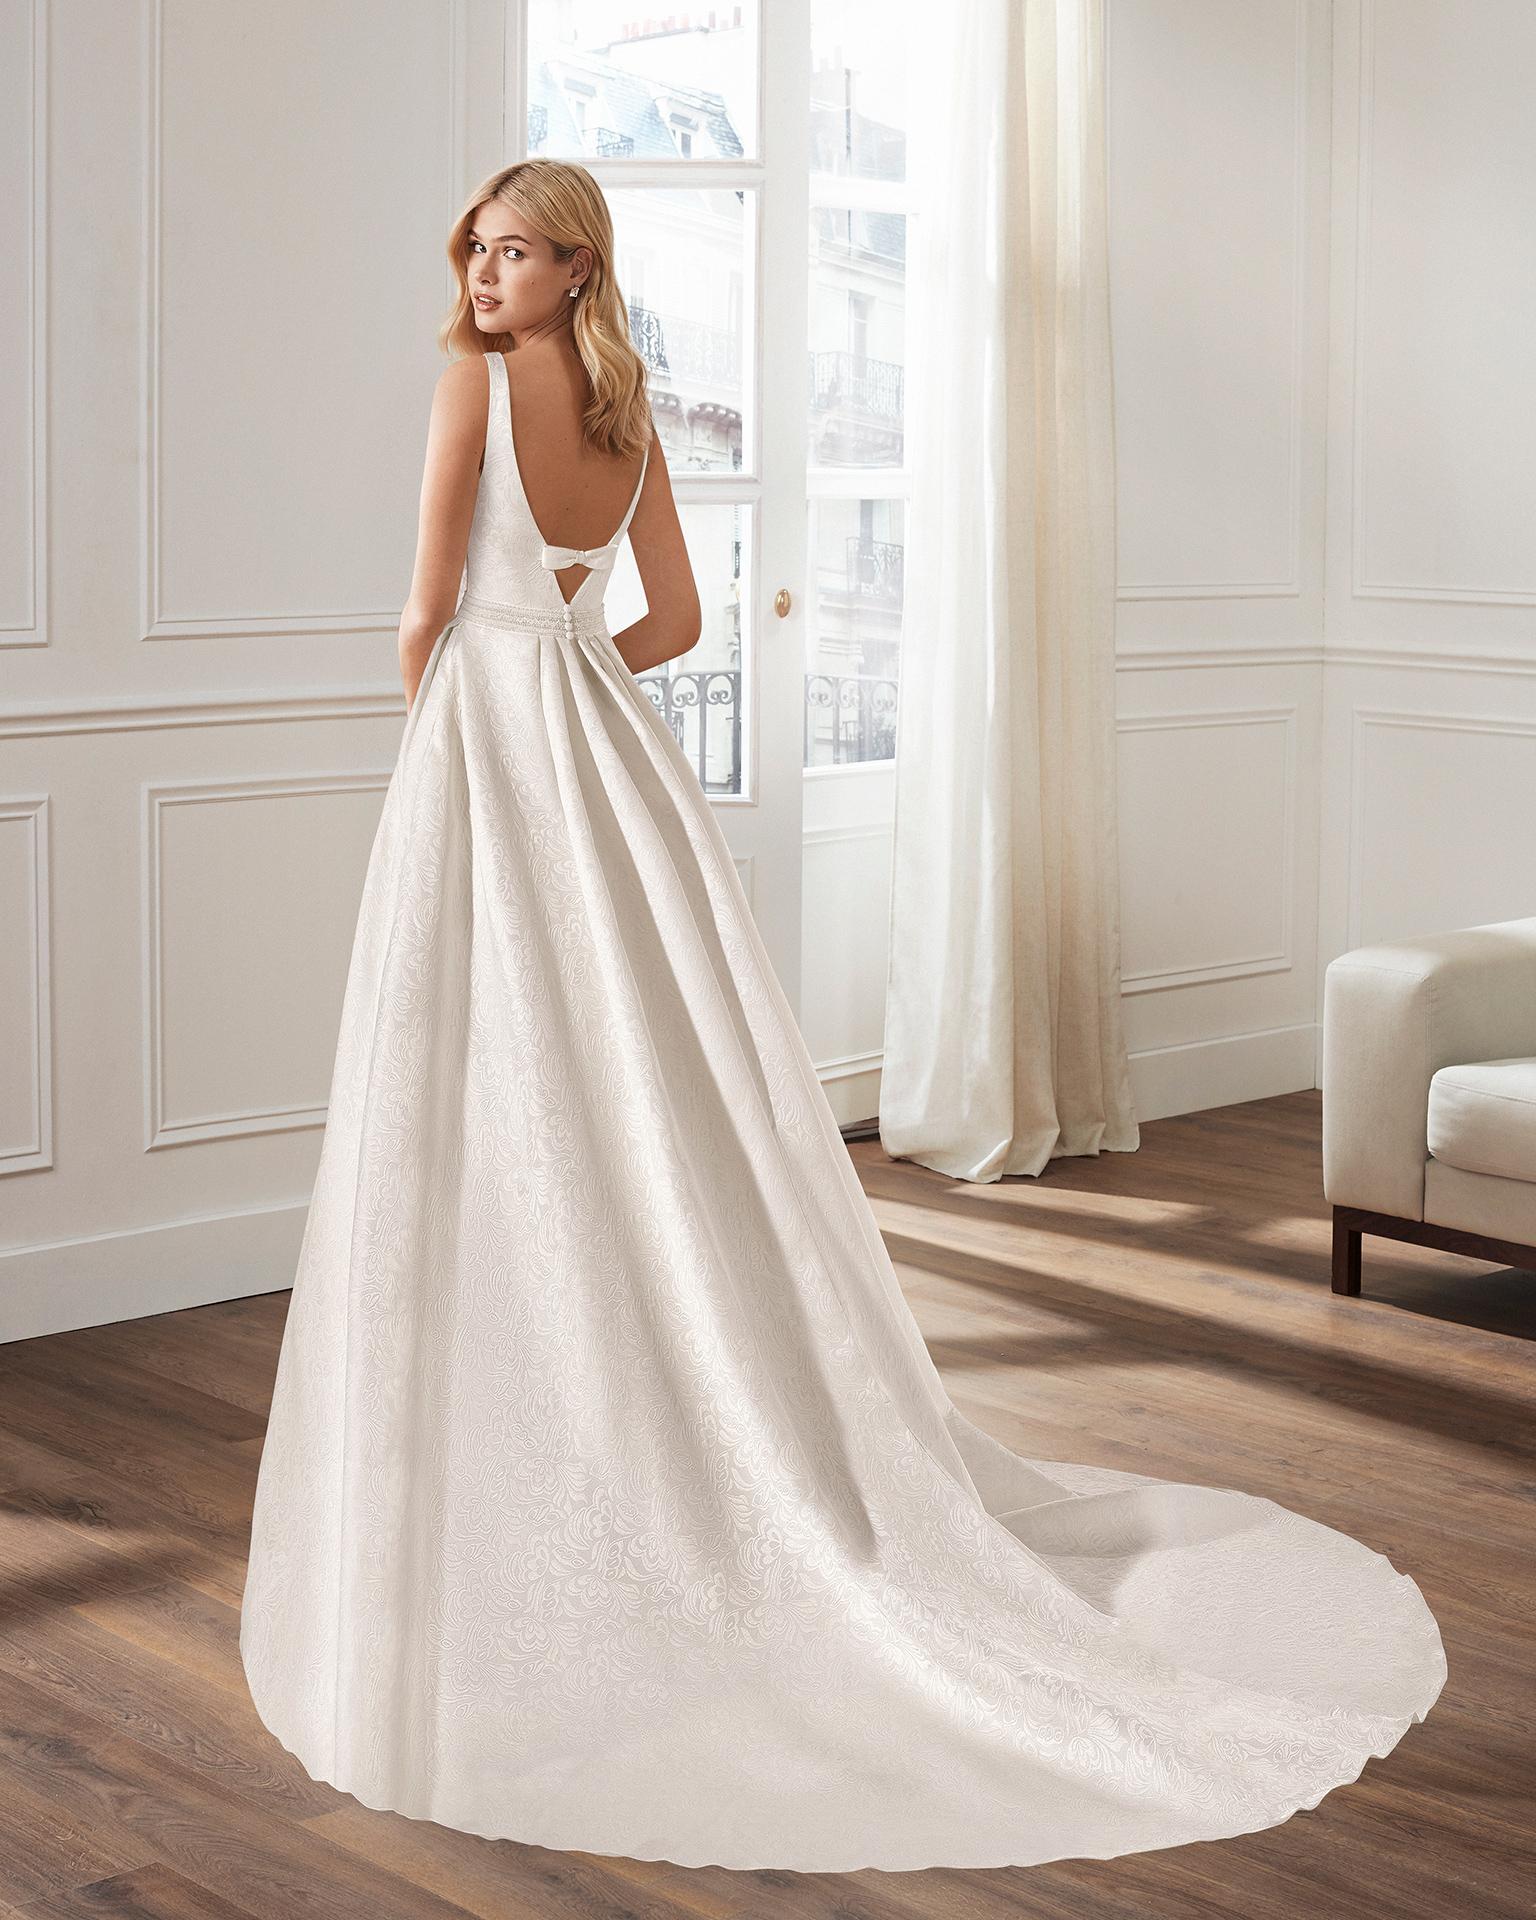 Beaded brocade wedding dress, in natural.